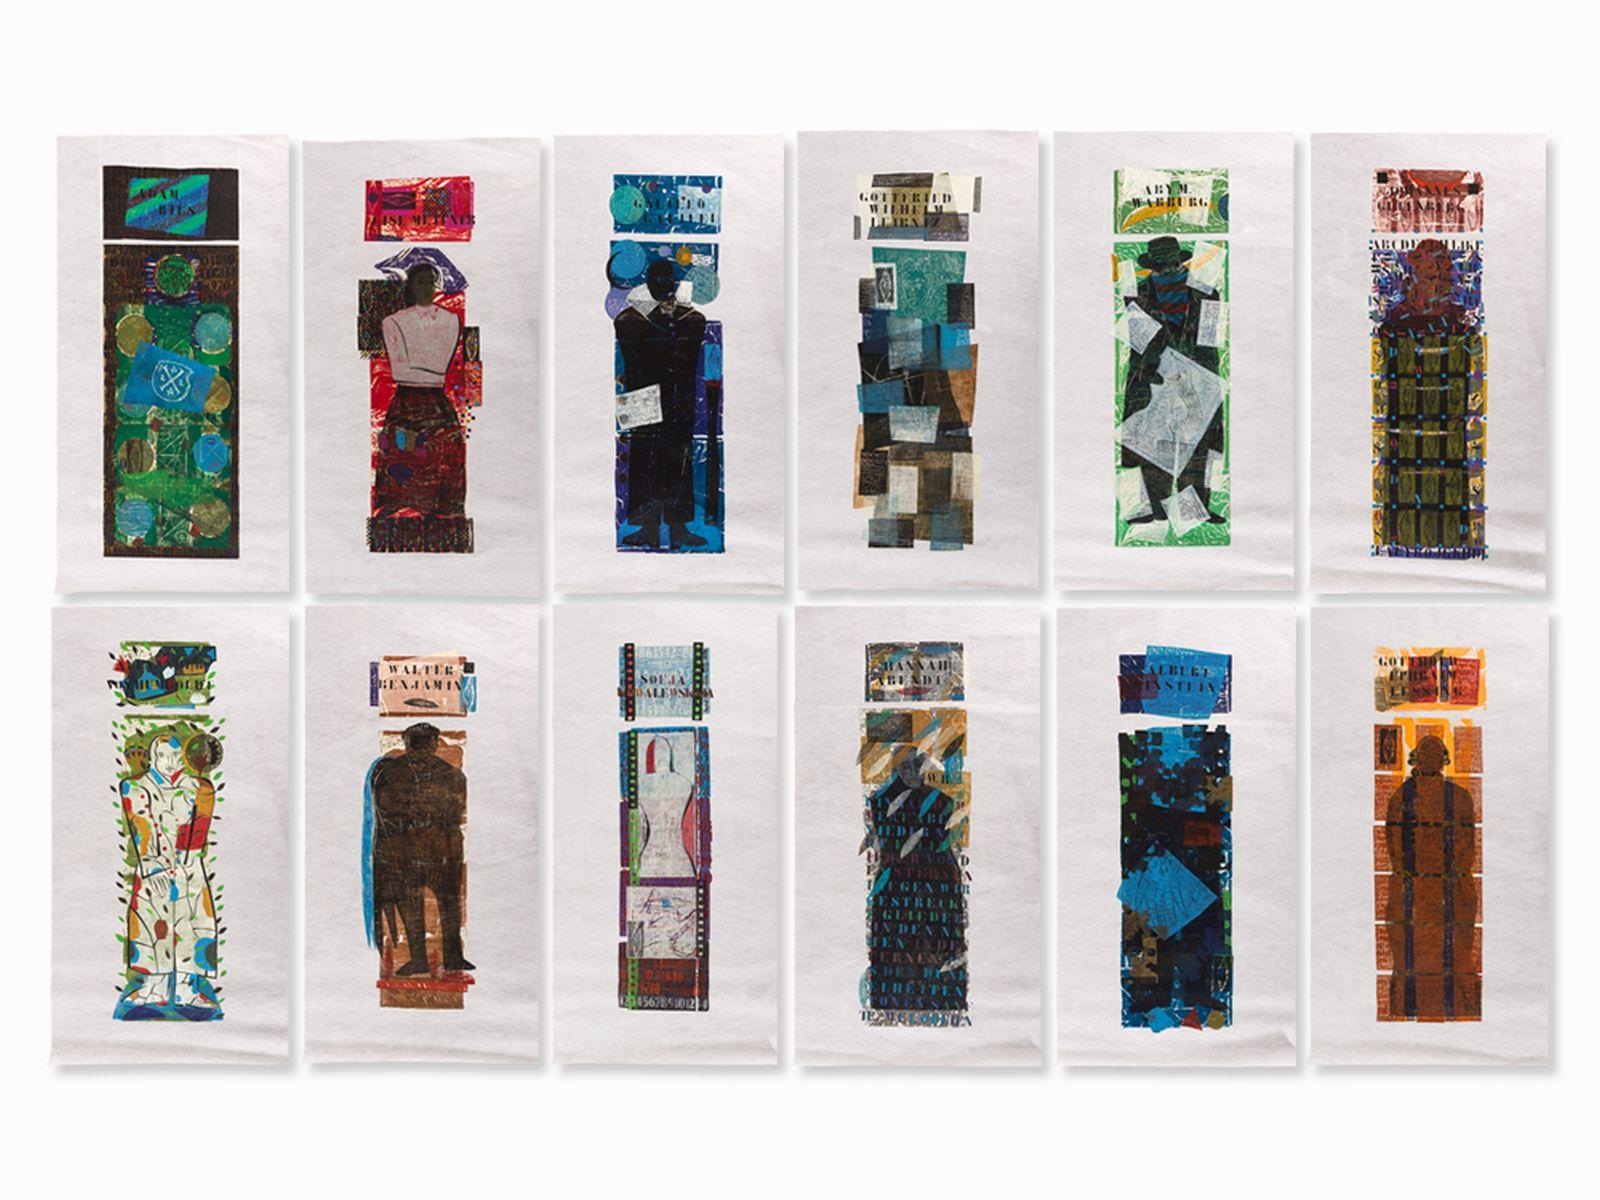 #6 Ruth Tesmar, Symposion, 12 Woodcuts , 1999/2000 | Ruth Tesmar(* 8. April 1951 in Potsdam) , Symposion, 12 Farbholzschnitte, 1999/2000 Image